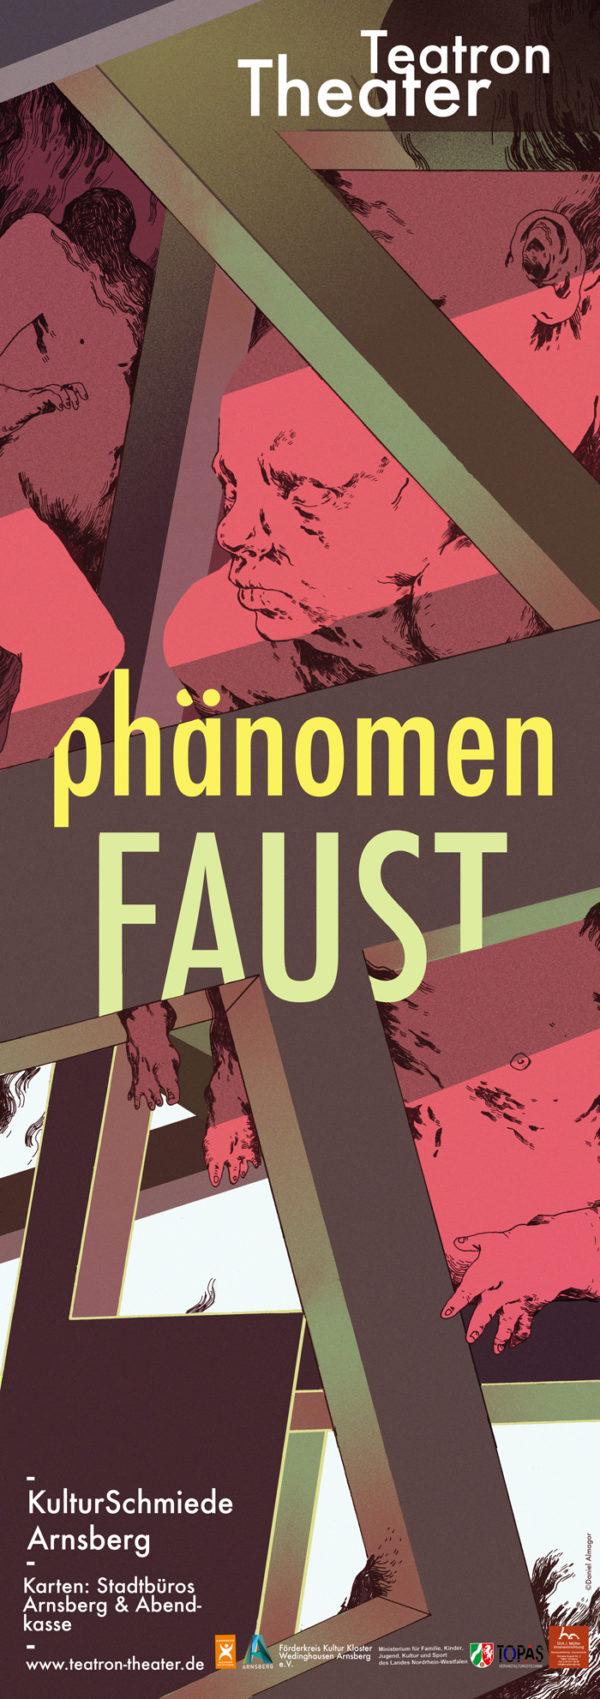 Phänomen-Faust-rgb-blanko